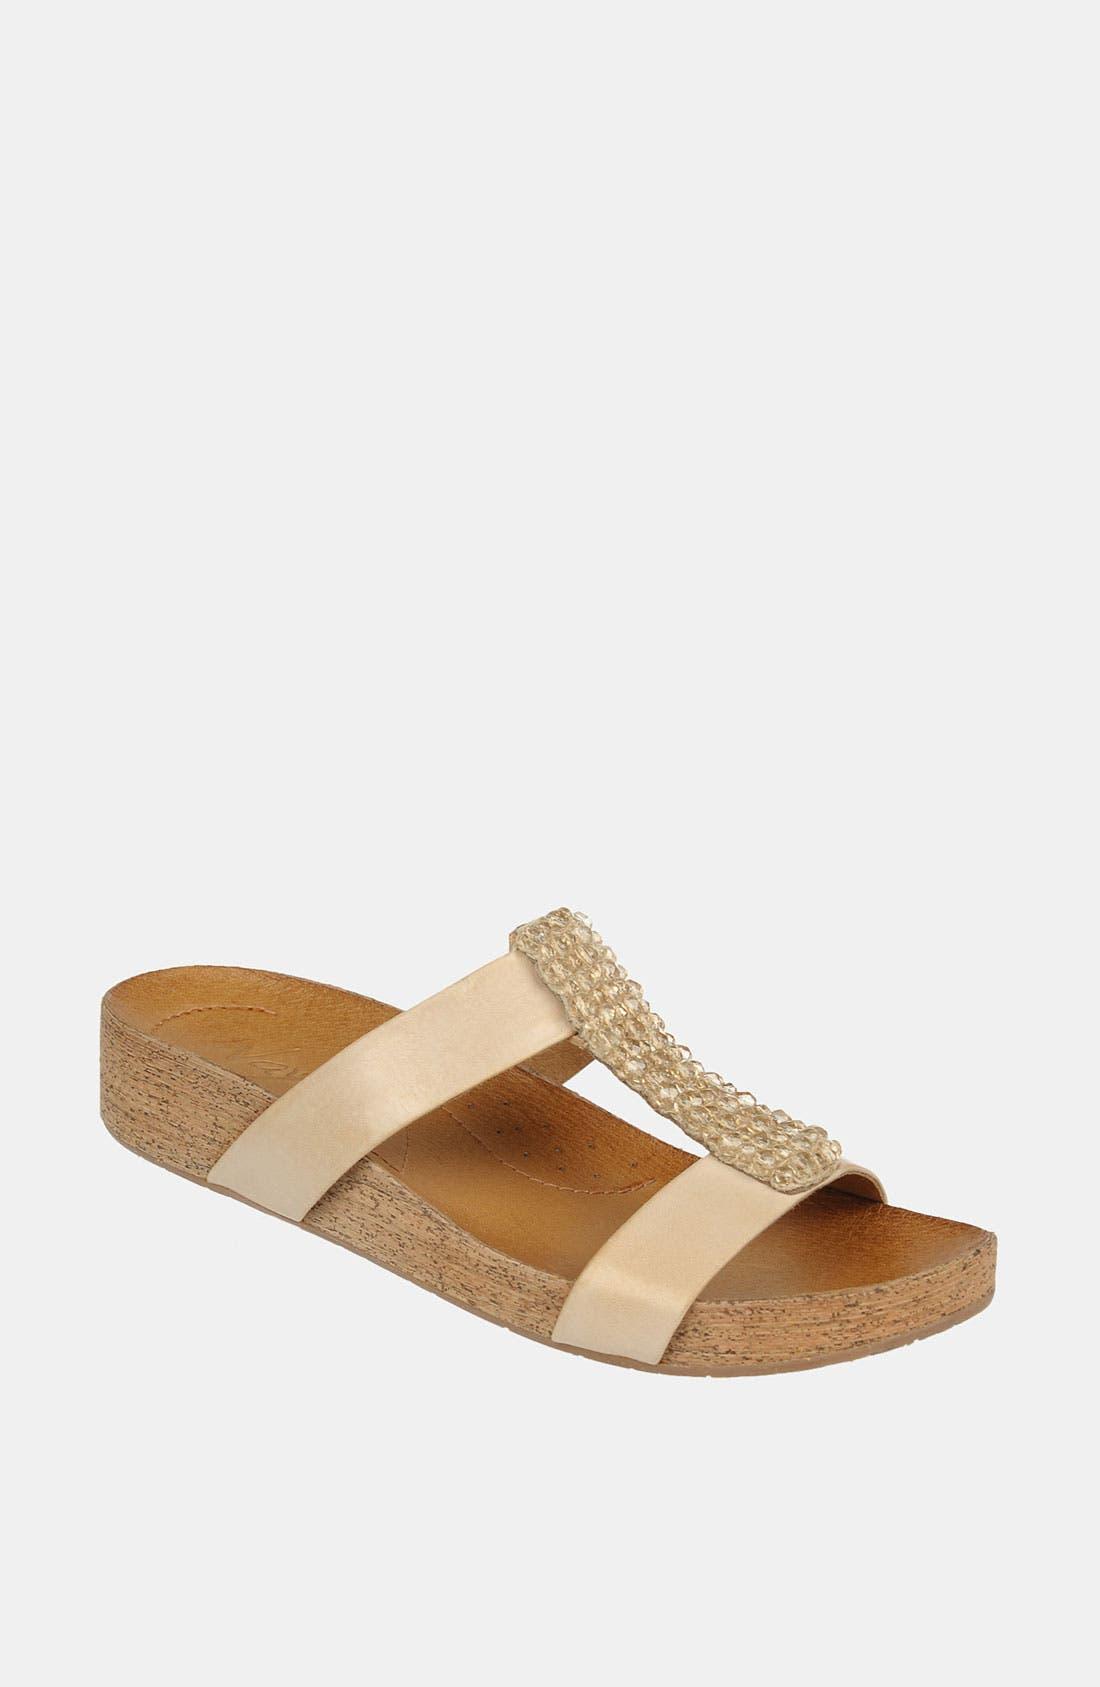 Alternate Image 1 Selected - Naya 'Belle' Sandal